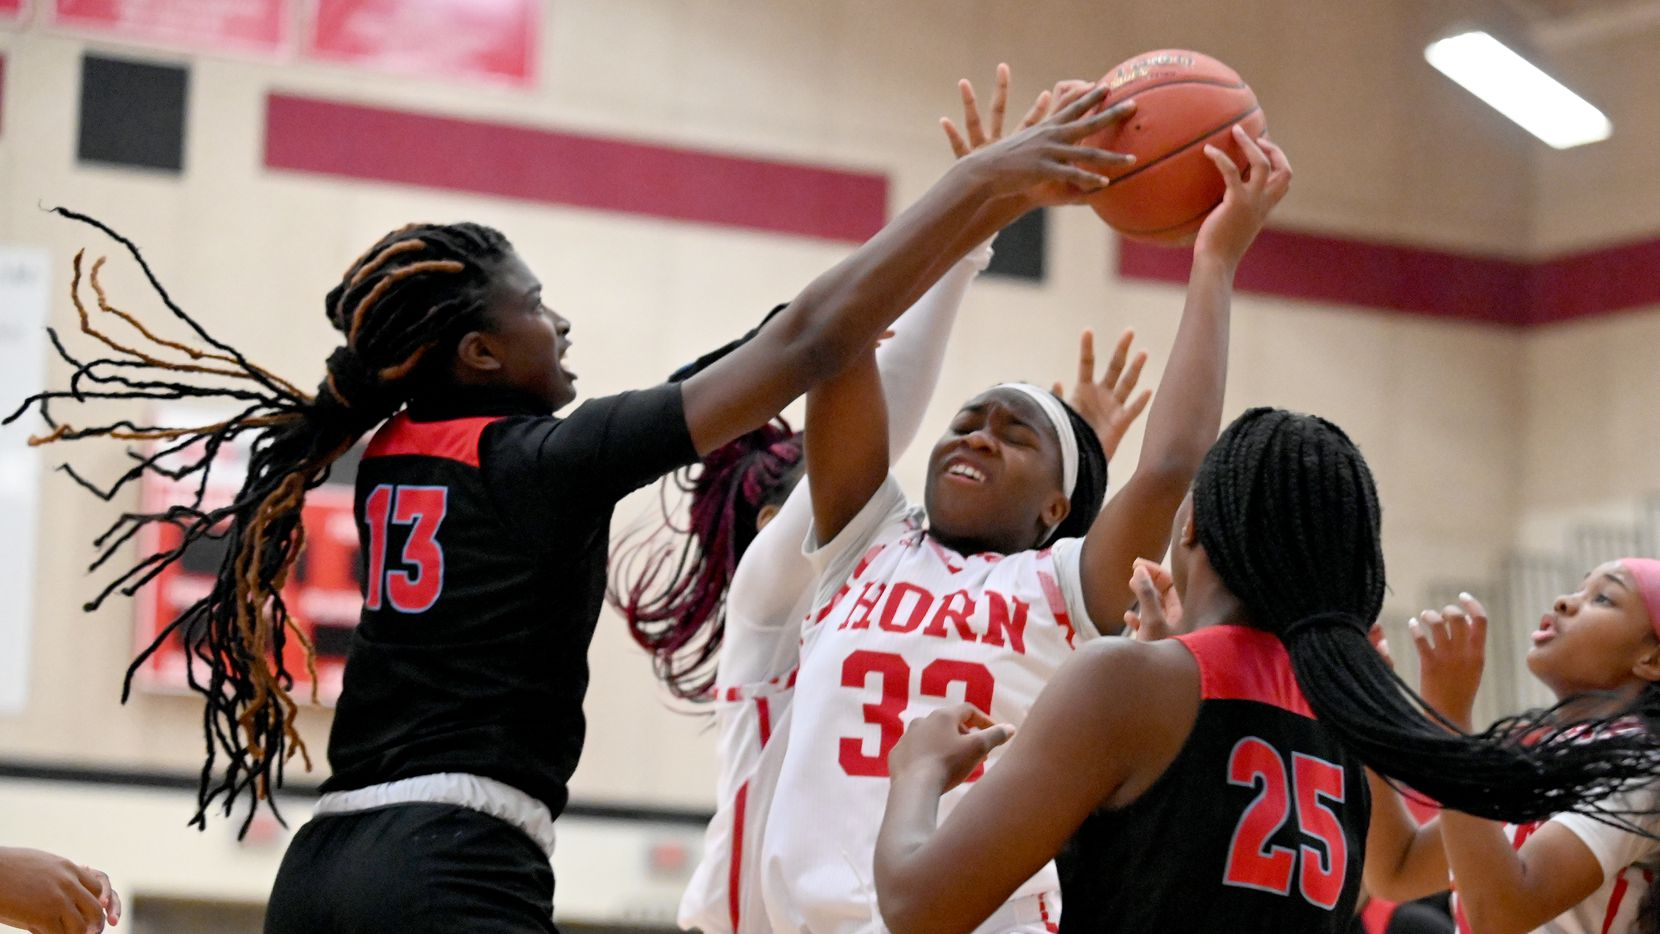 Horn's Vemell Atamah (32) grabs a rebound between Skyline's Jaida Mcdonald (13) and Breniya Arnold in the first half during a girls high school basketball game between Skyline and Mesquite Horn, Tuesday, Jan. 5, 2021, in Mesquite, Texas.